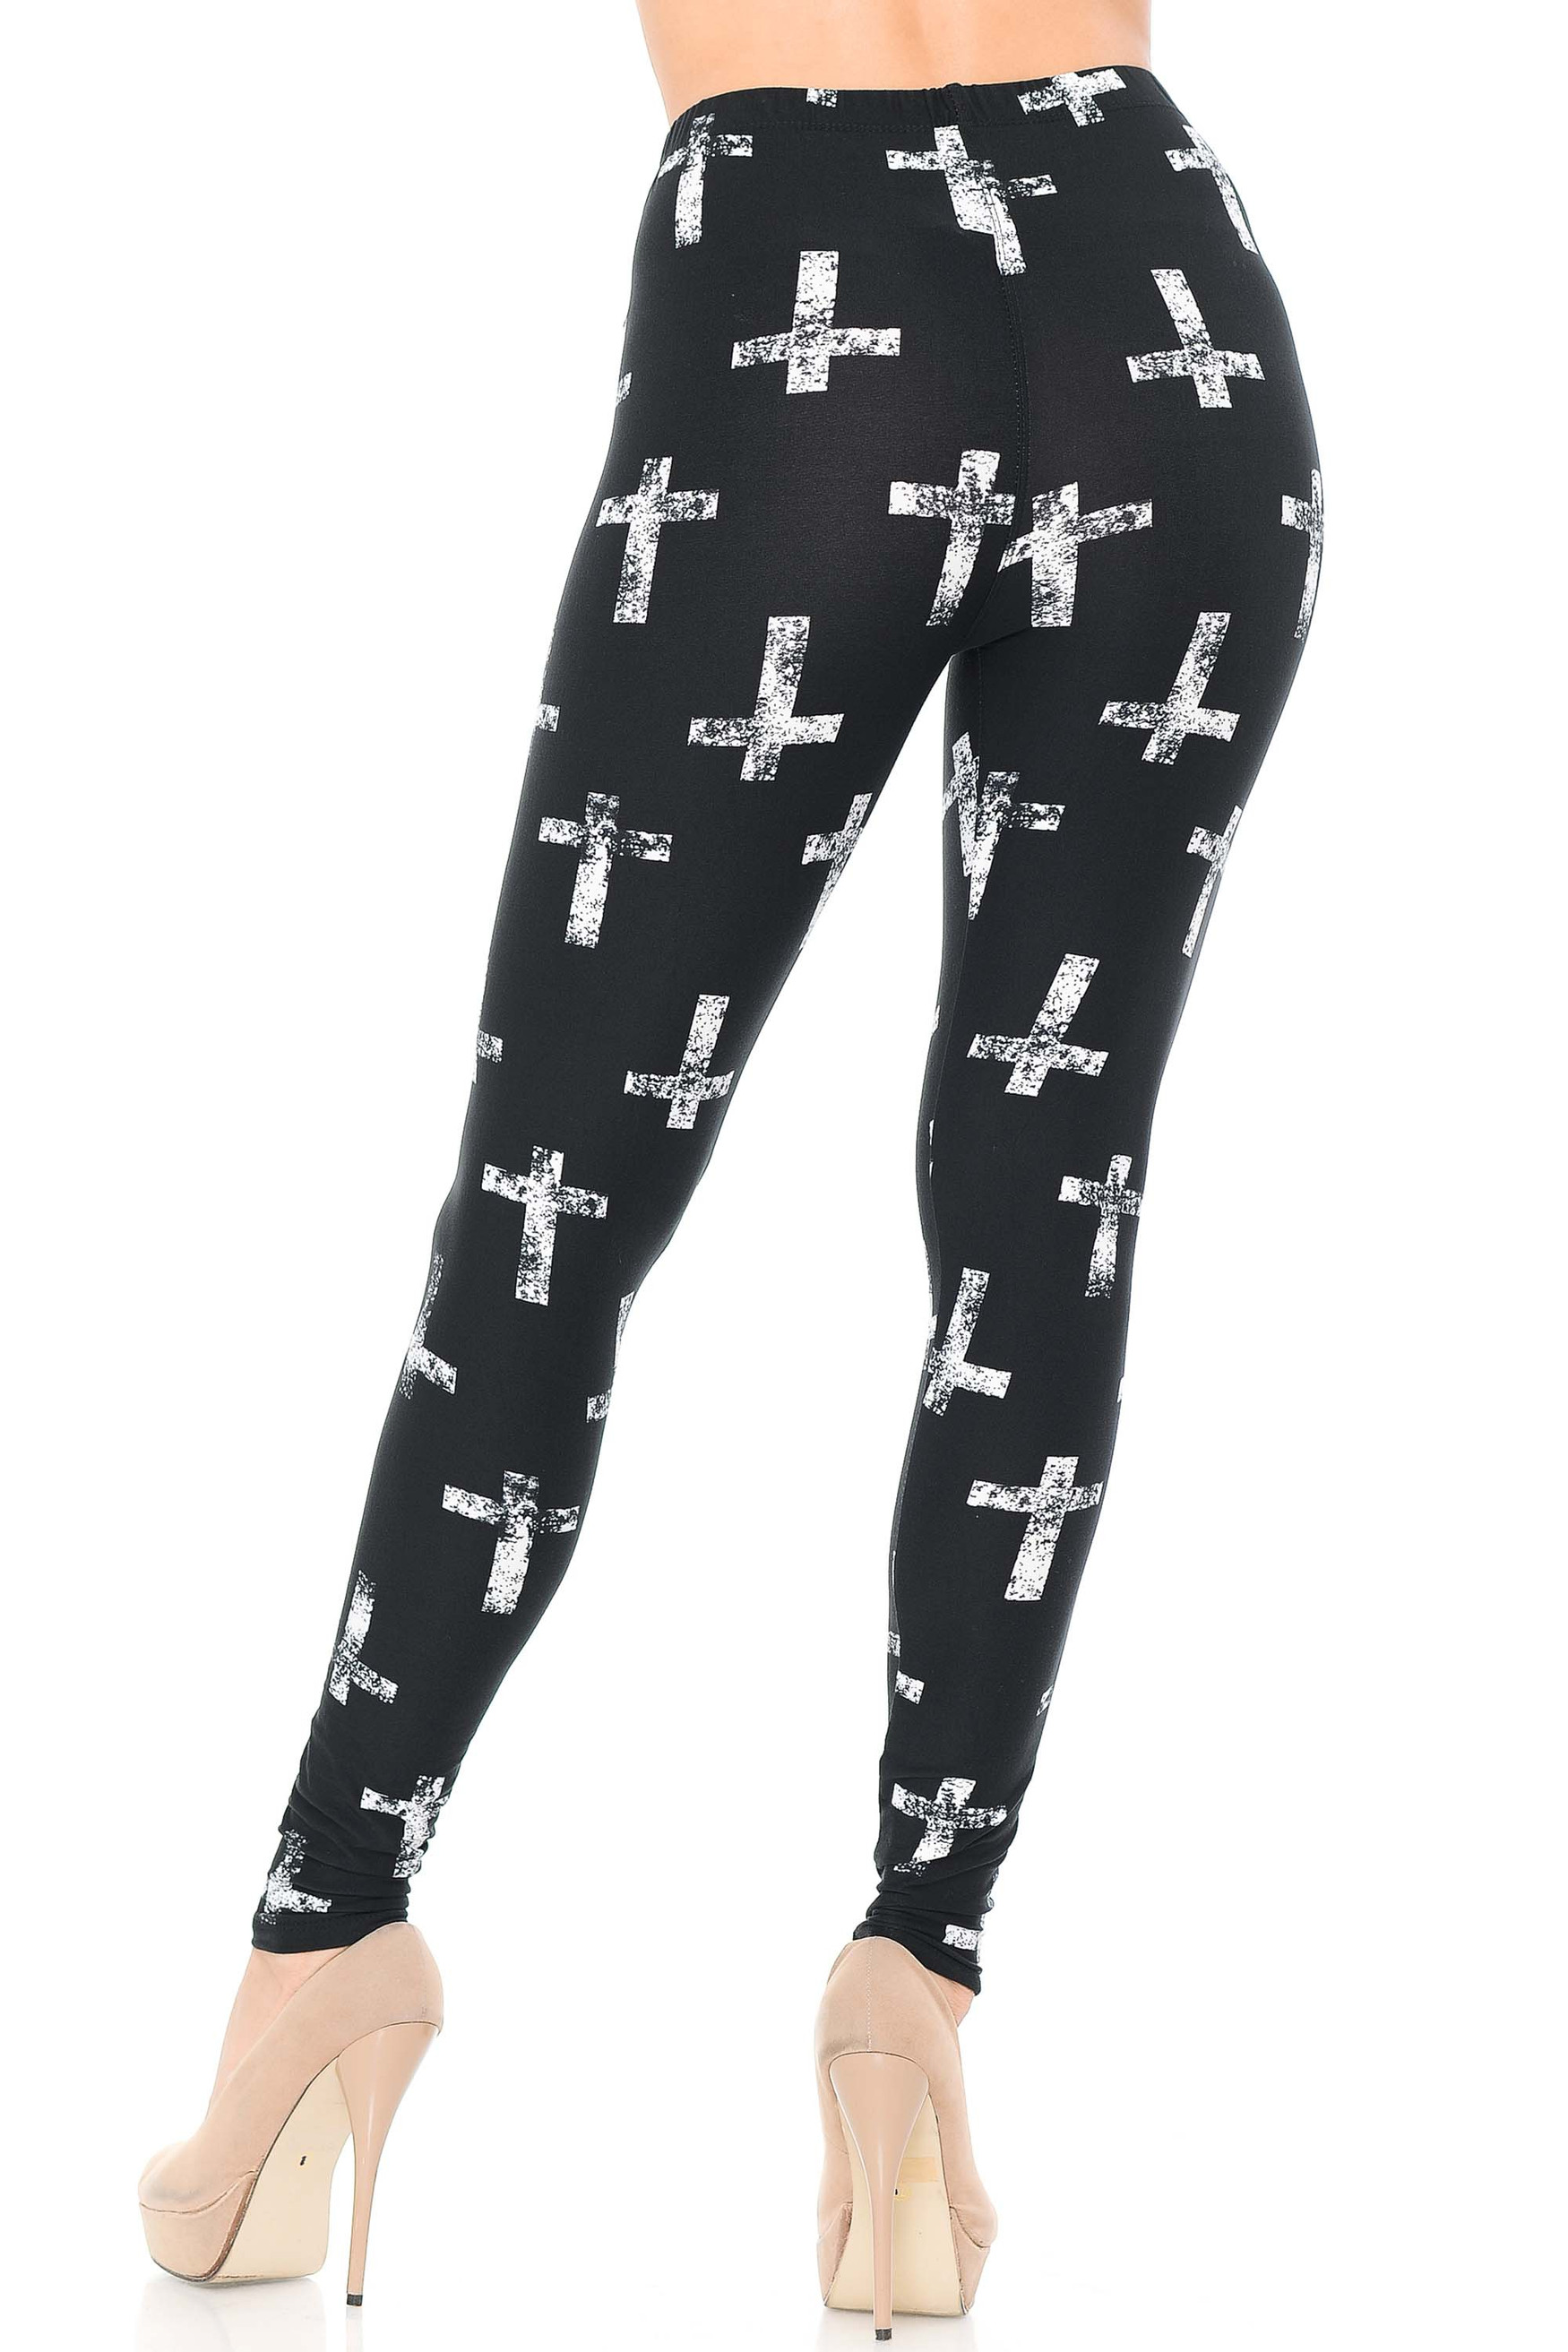 Brushed  Faded Cross Plus Size Leggings